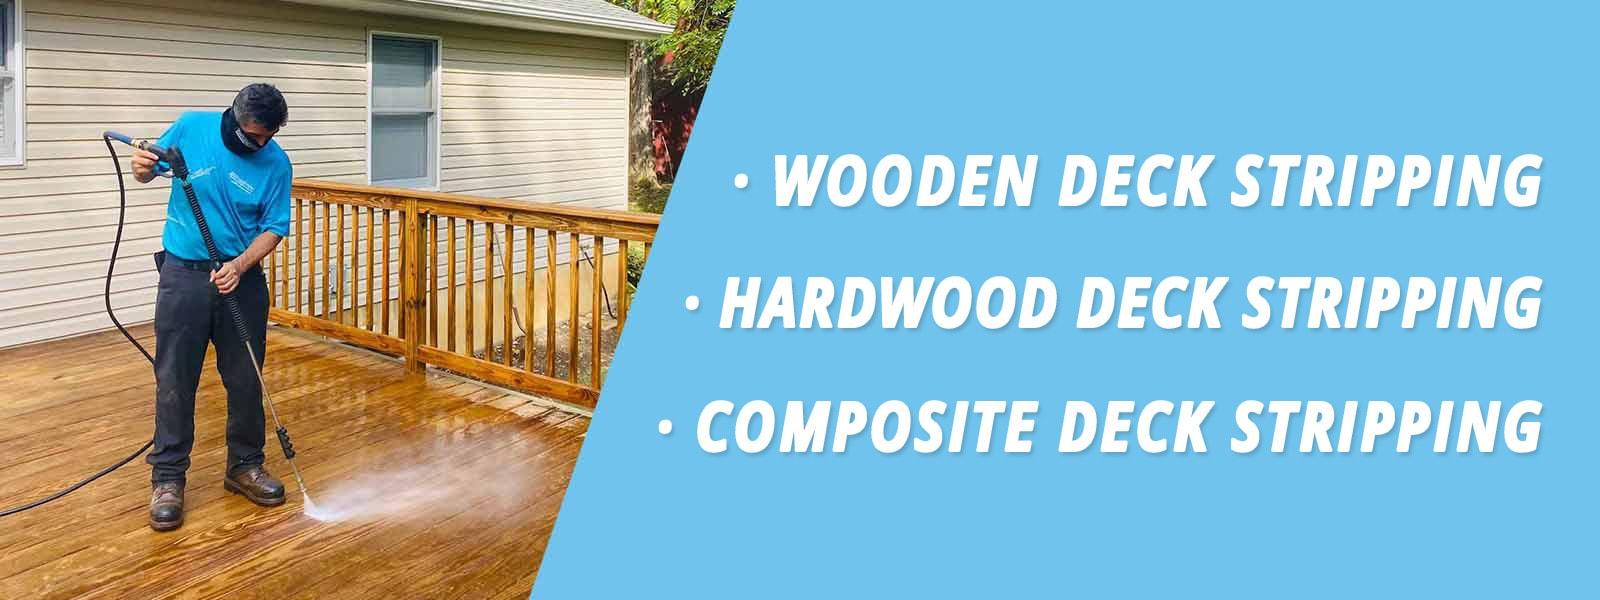 wood deck stripping hardwood deck stripping composite deck stripping copy